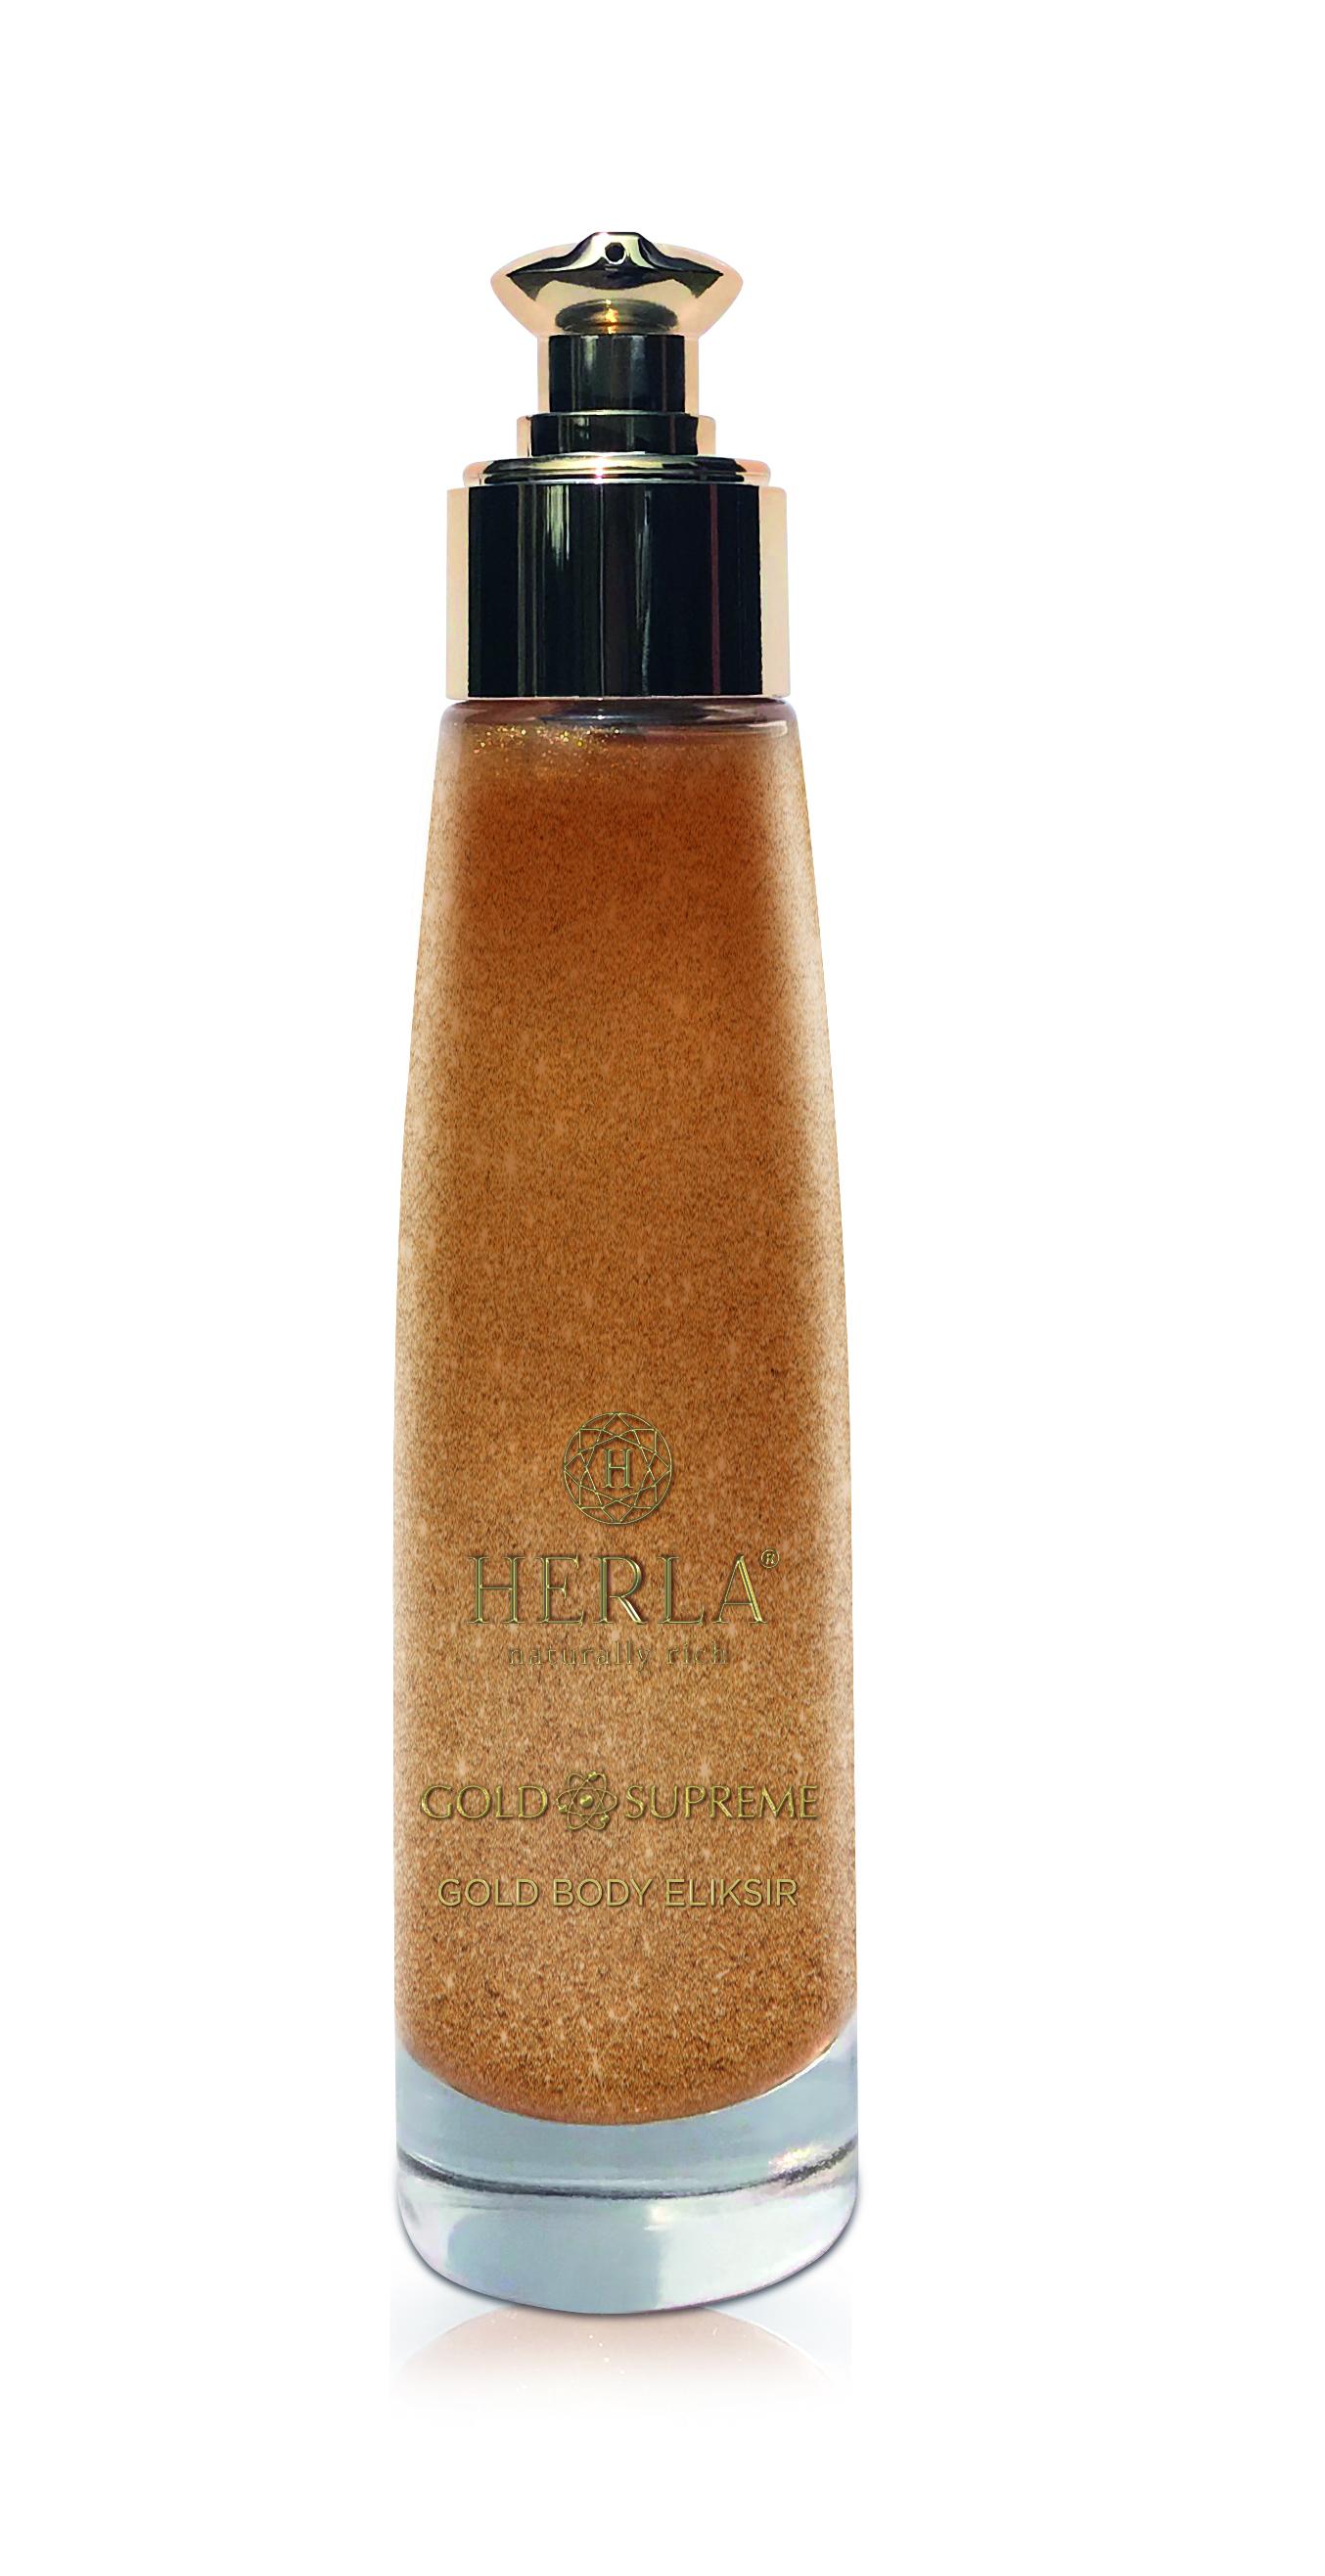 Herla Gold Supreme